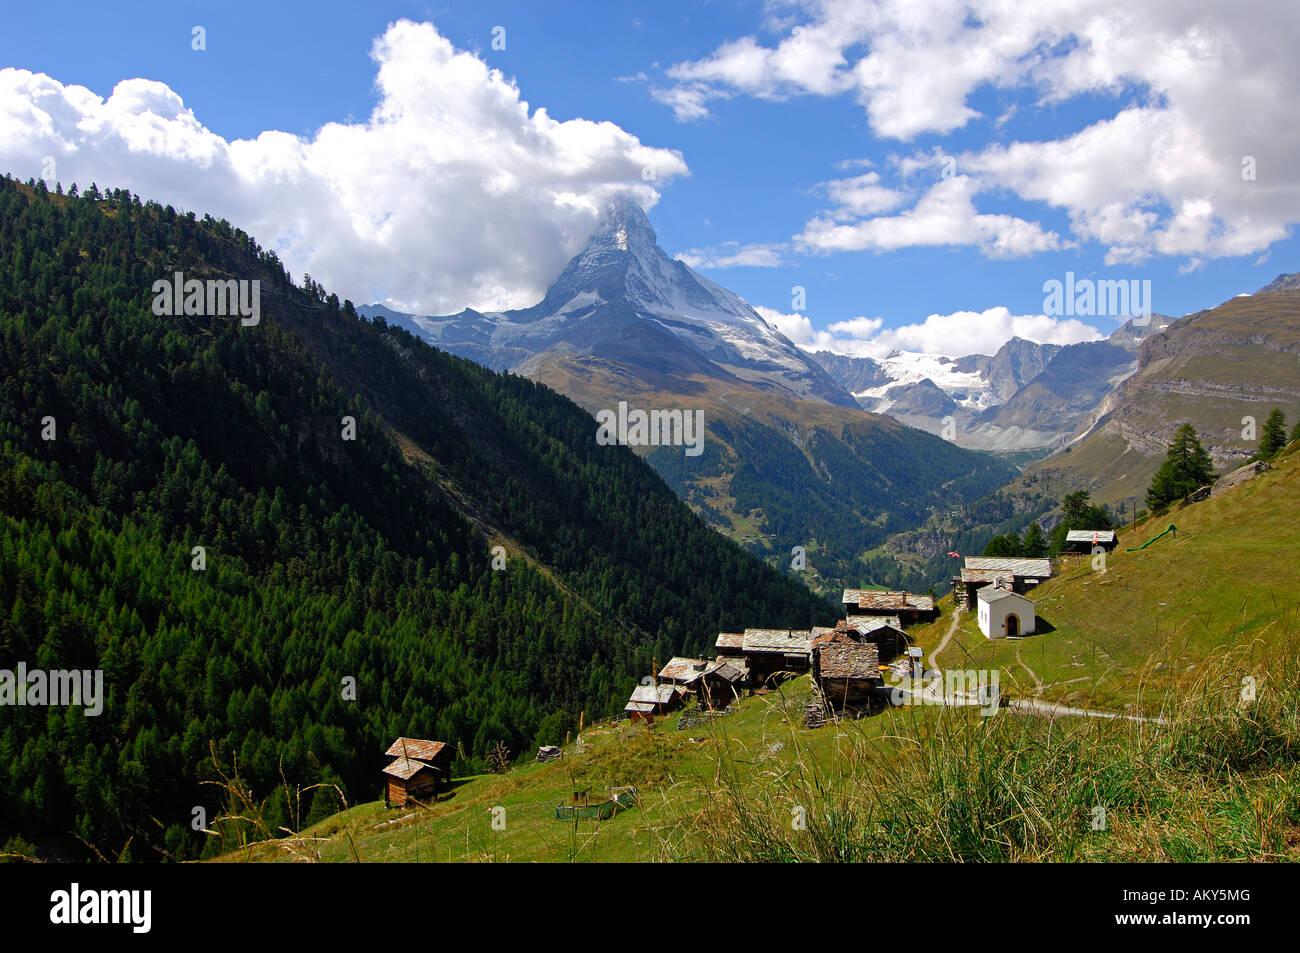 Hamlet Findeln, Mount Cervin, Matterhorn, Zermatt, Valais, Switzerland - Stock Image